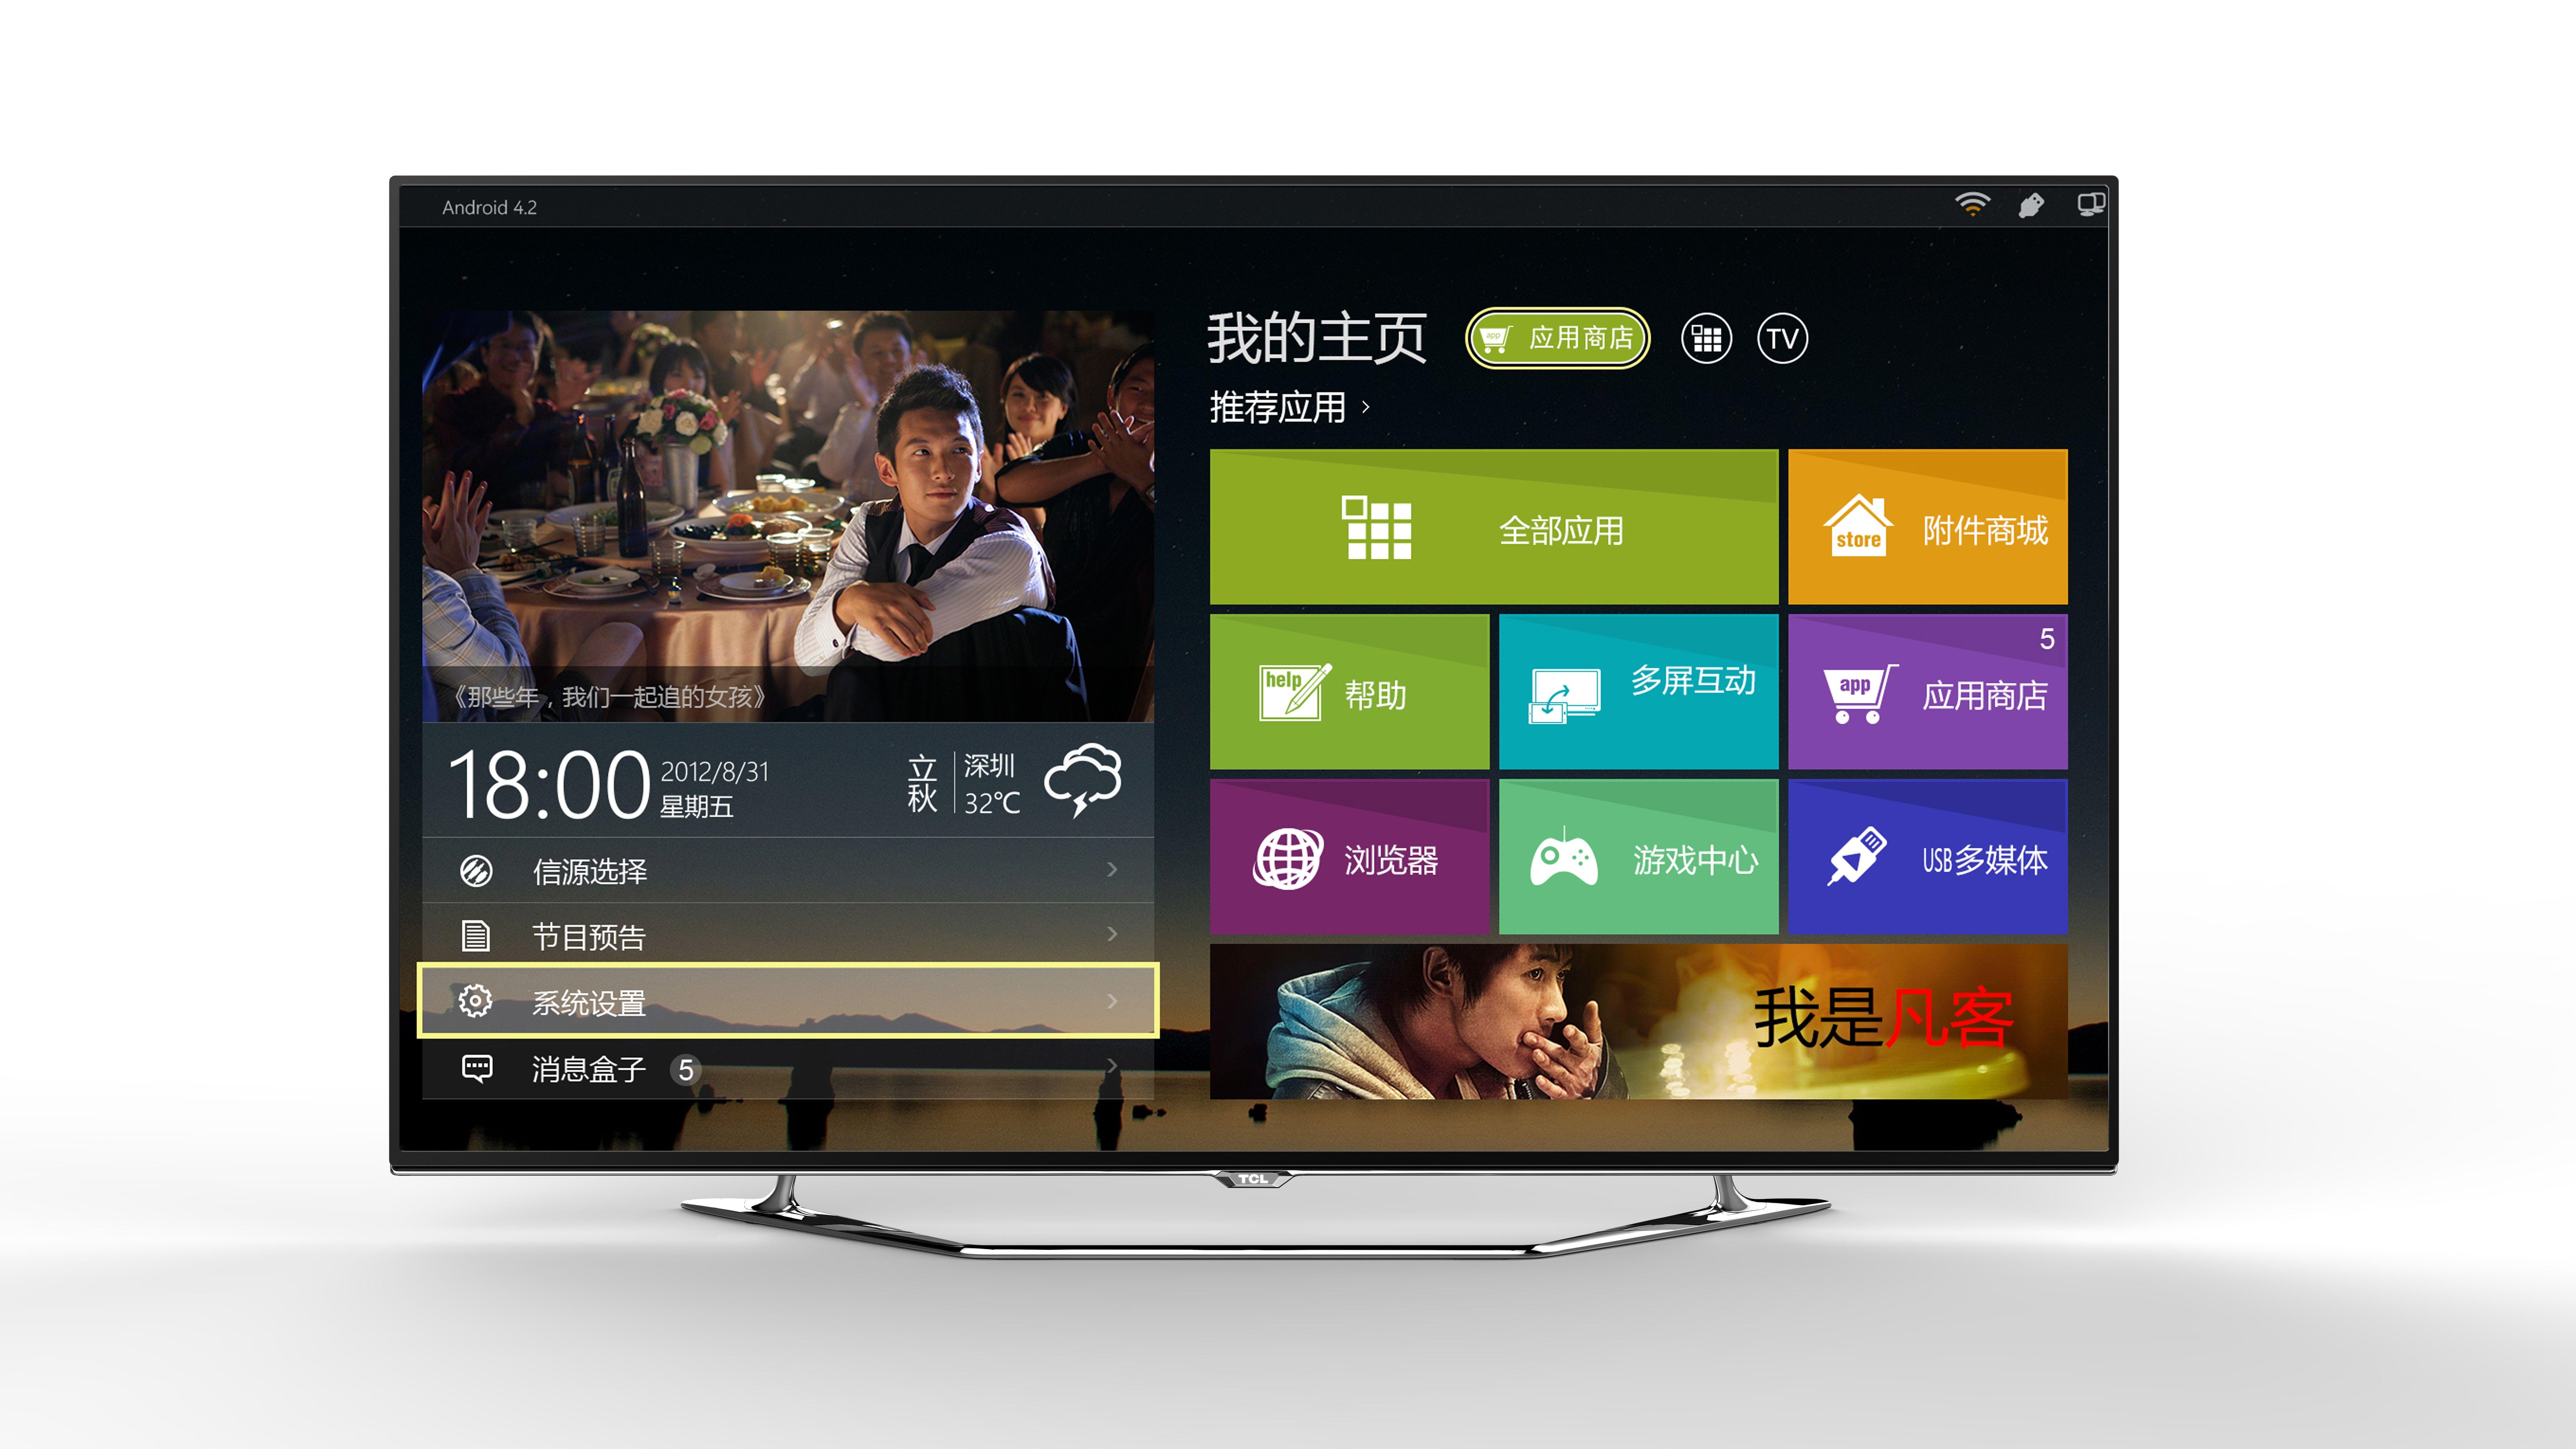 TCL 4K电视E5700 E6700入选最佳观赛装备